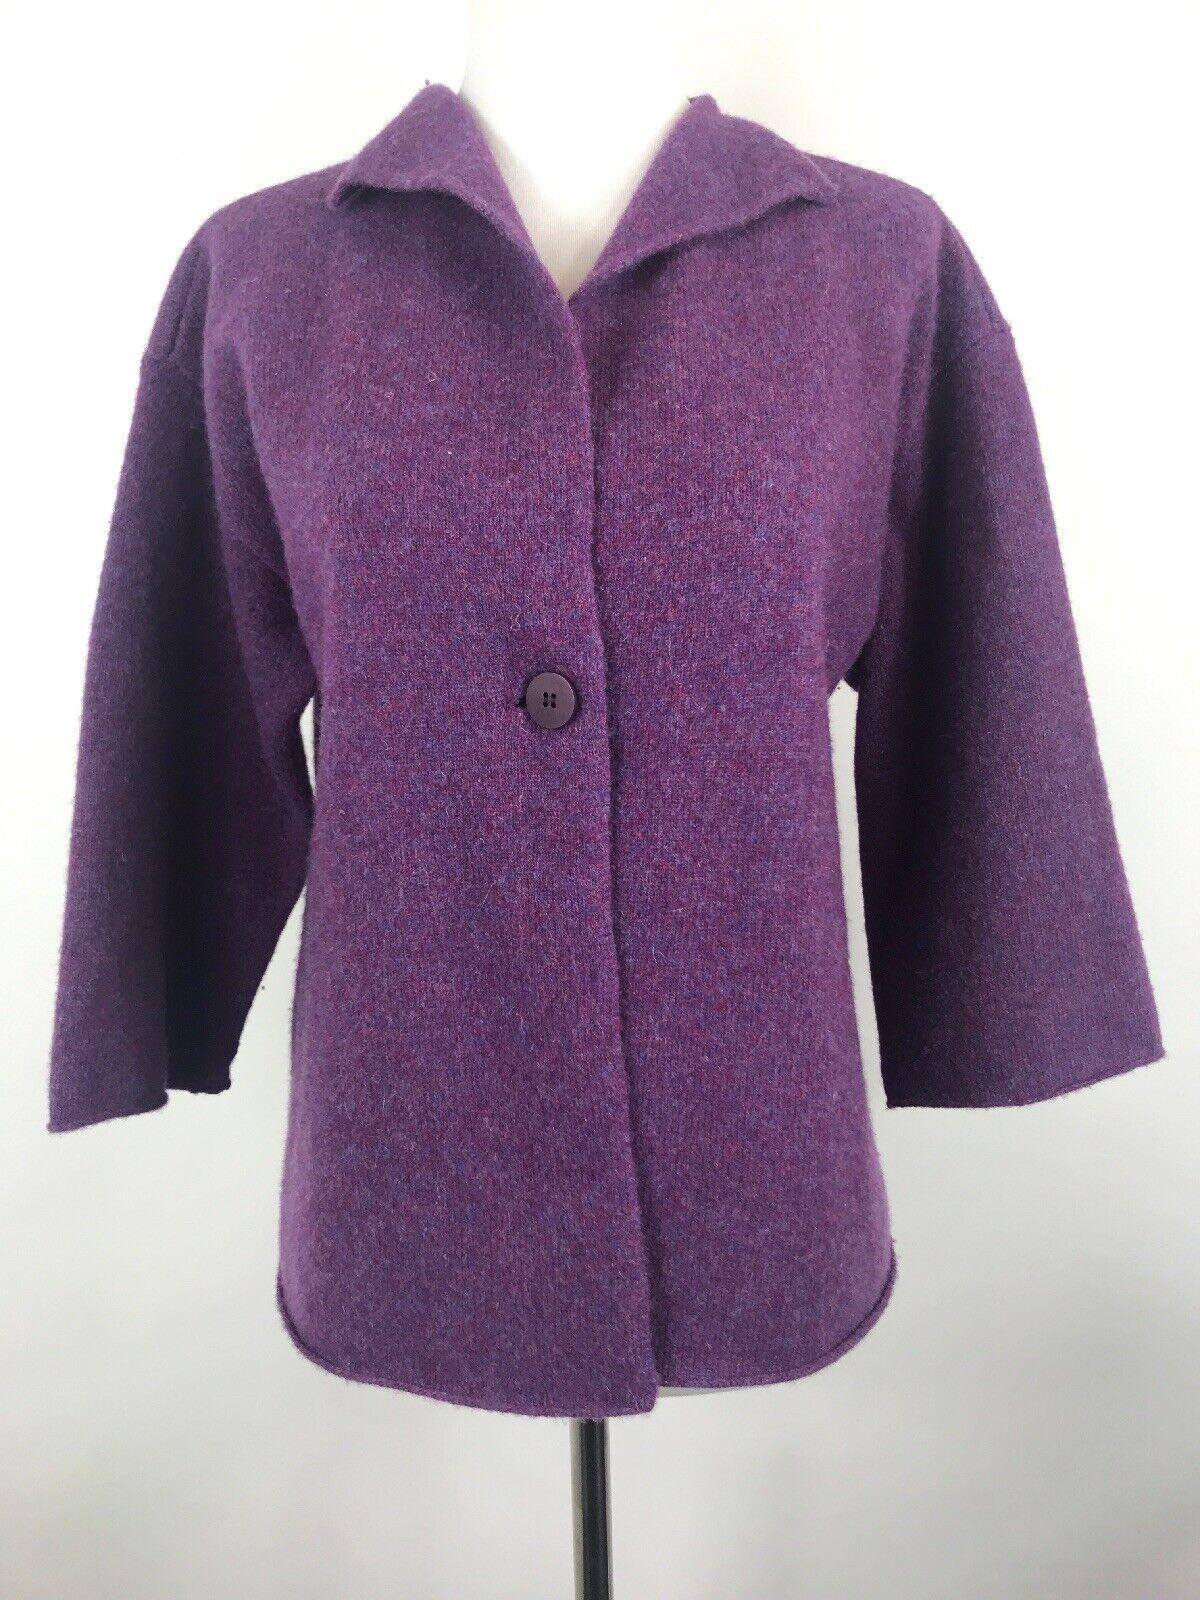 Eileen Fisher Petite Small Italian Yarn Single Button Purple Cardigan PS